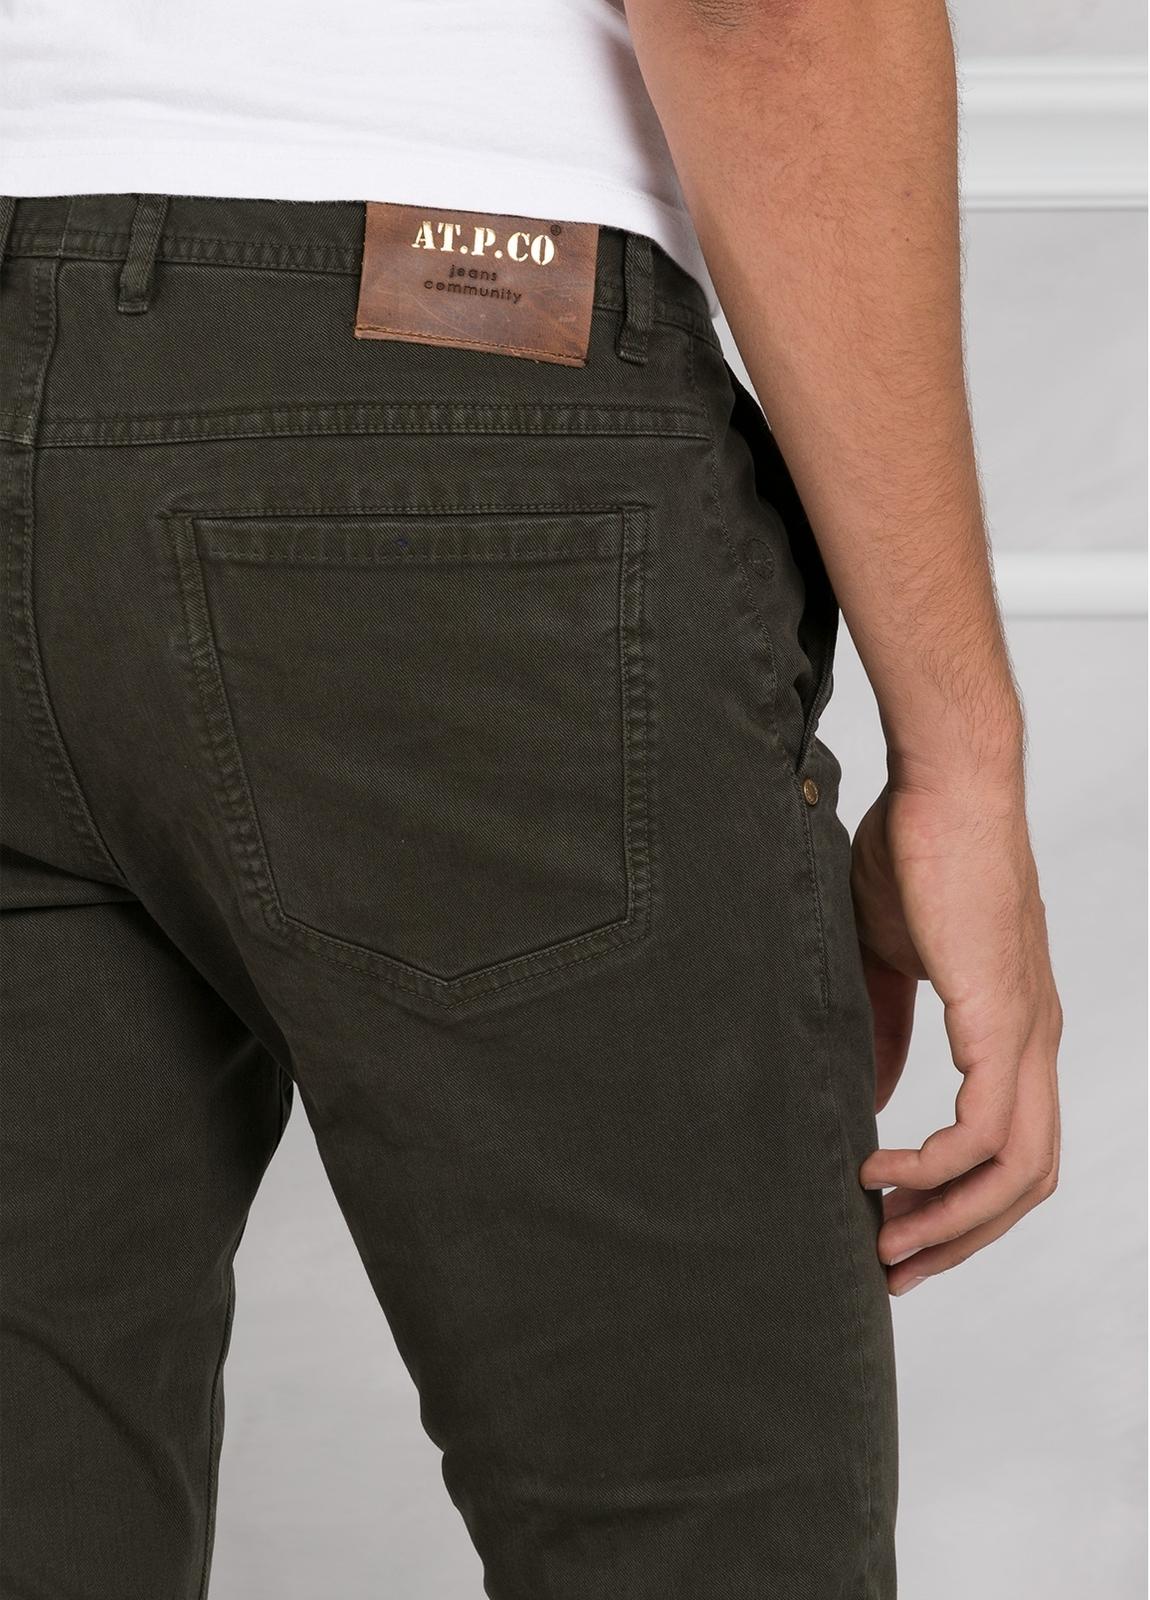 Pantalón 5 bolsillos modelo BRAD 01 color kaki. 97% Algodón 3% Elastán. - Ítem3